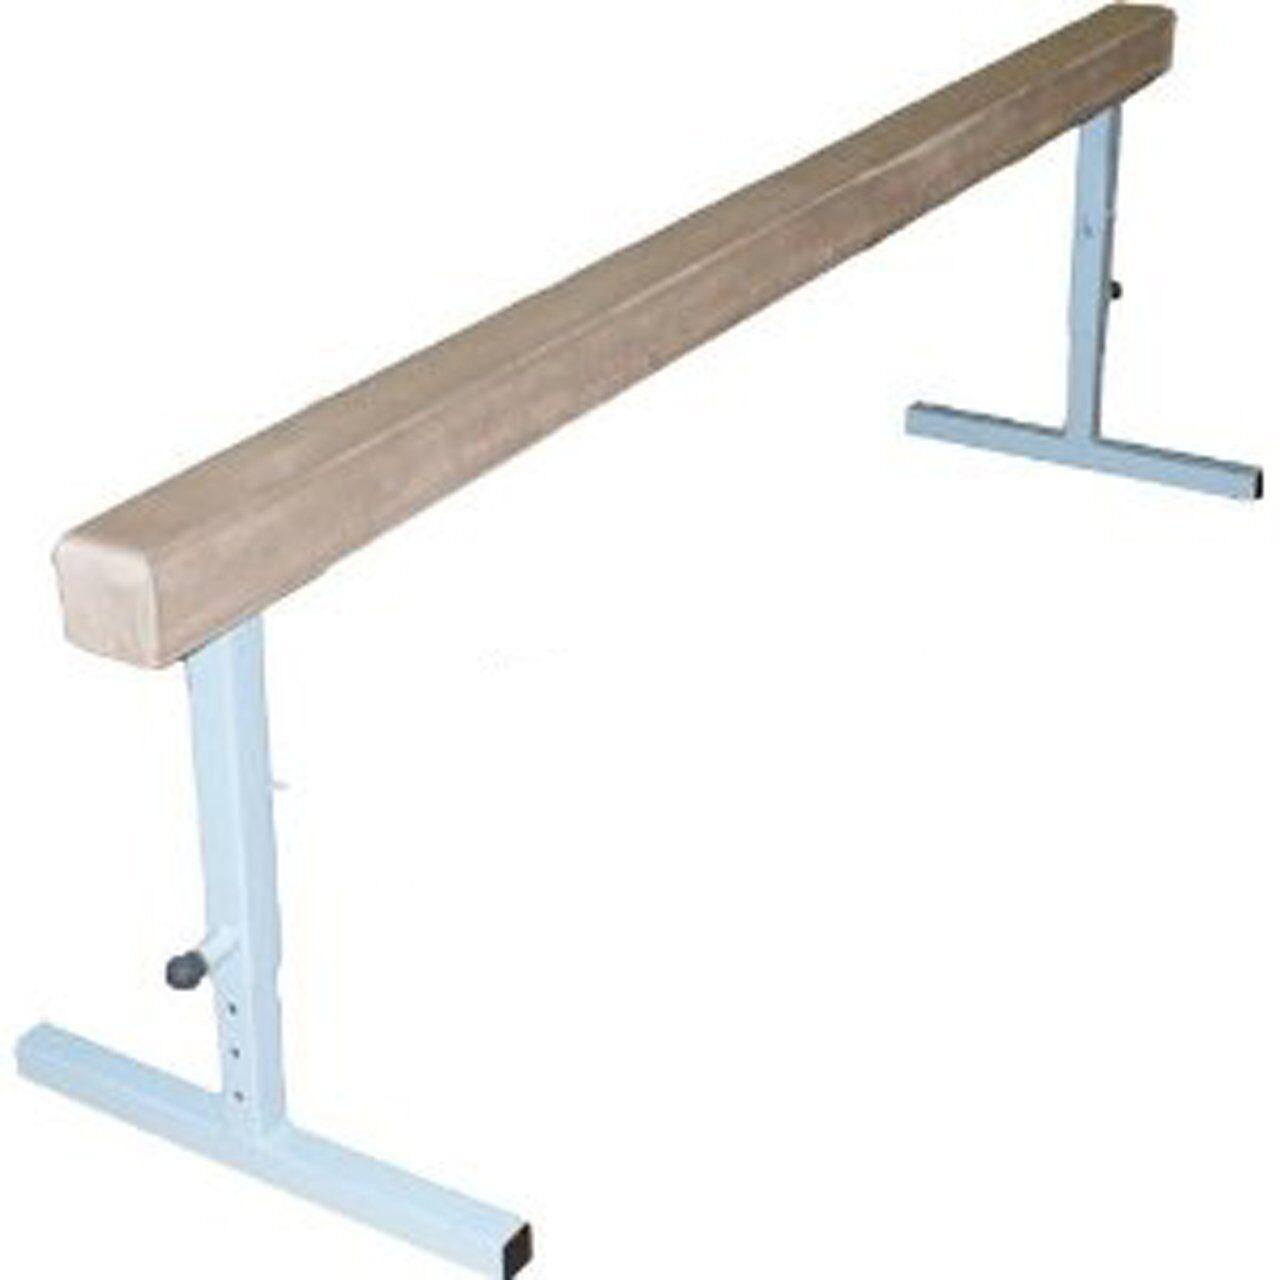 12 ft Tan Suede Gymnastics Balance Beam with 30  Adjustable Raised Metal Legs